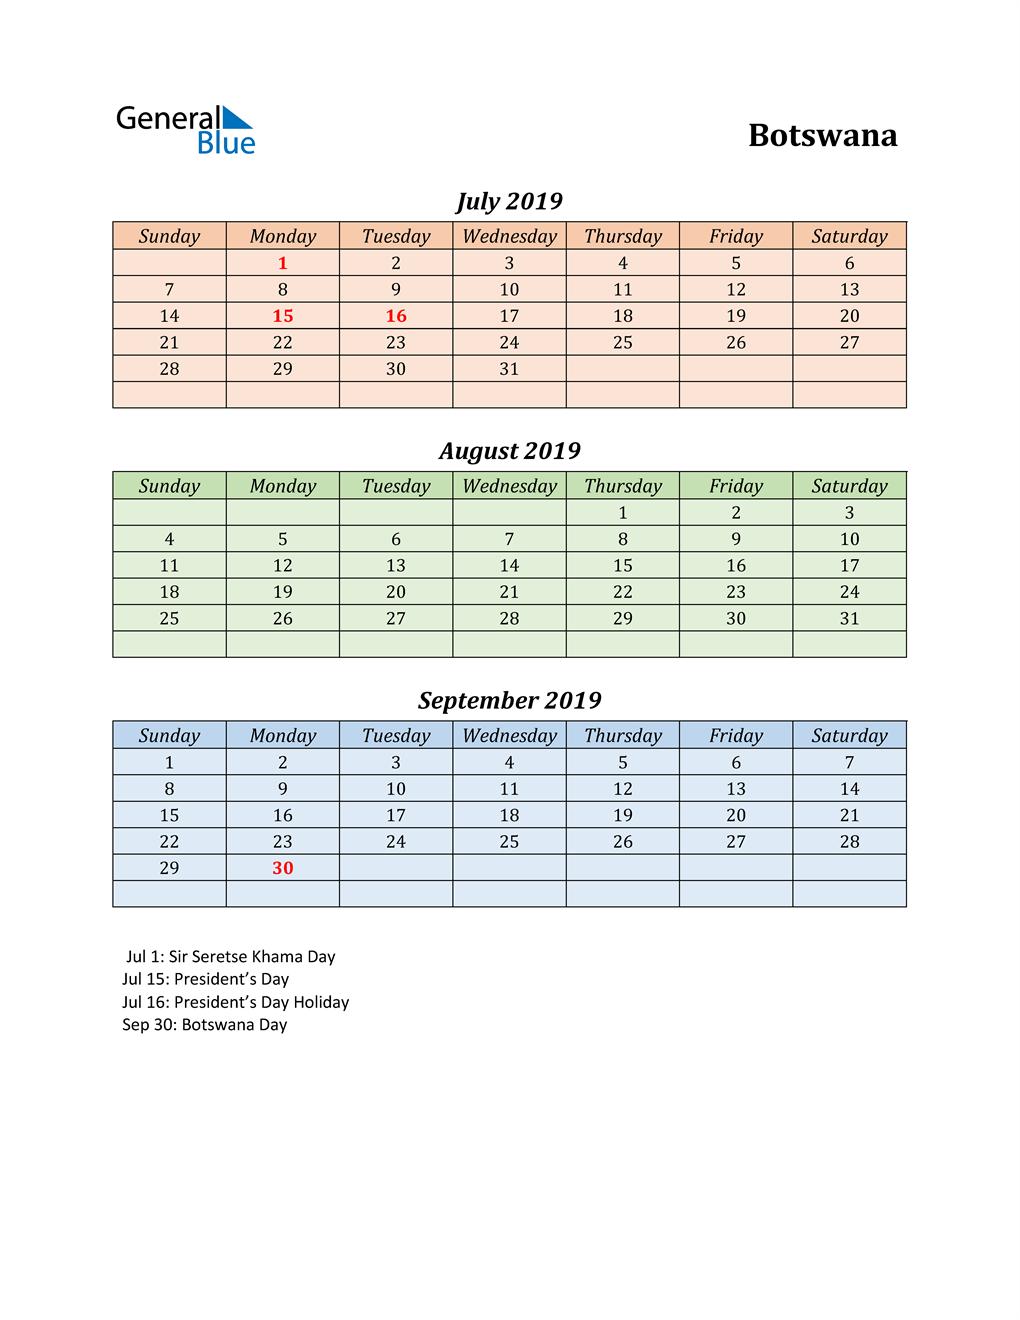 Q3 2019 Holiday Calendar - Botswana